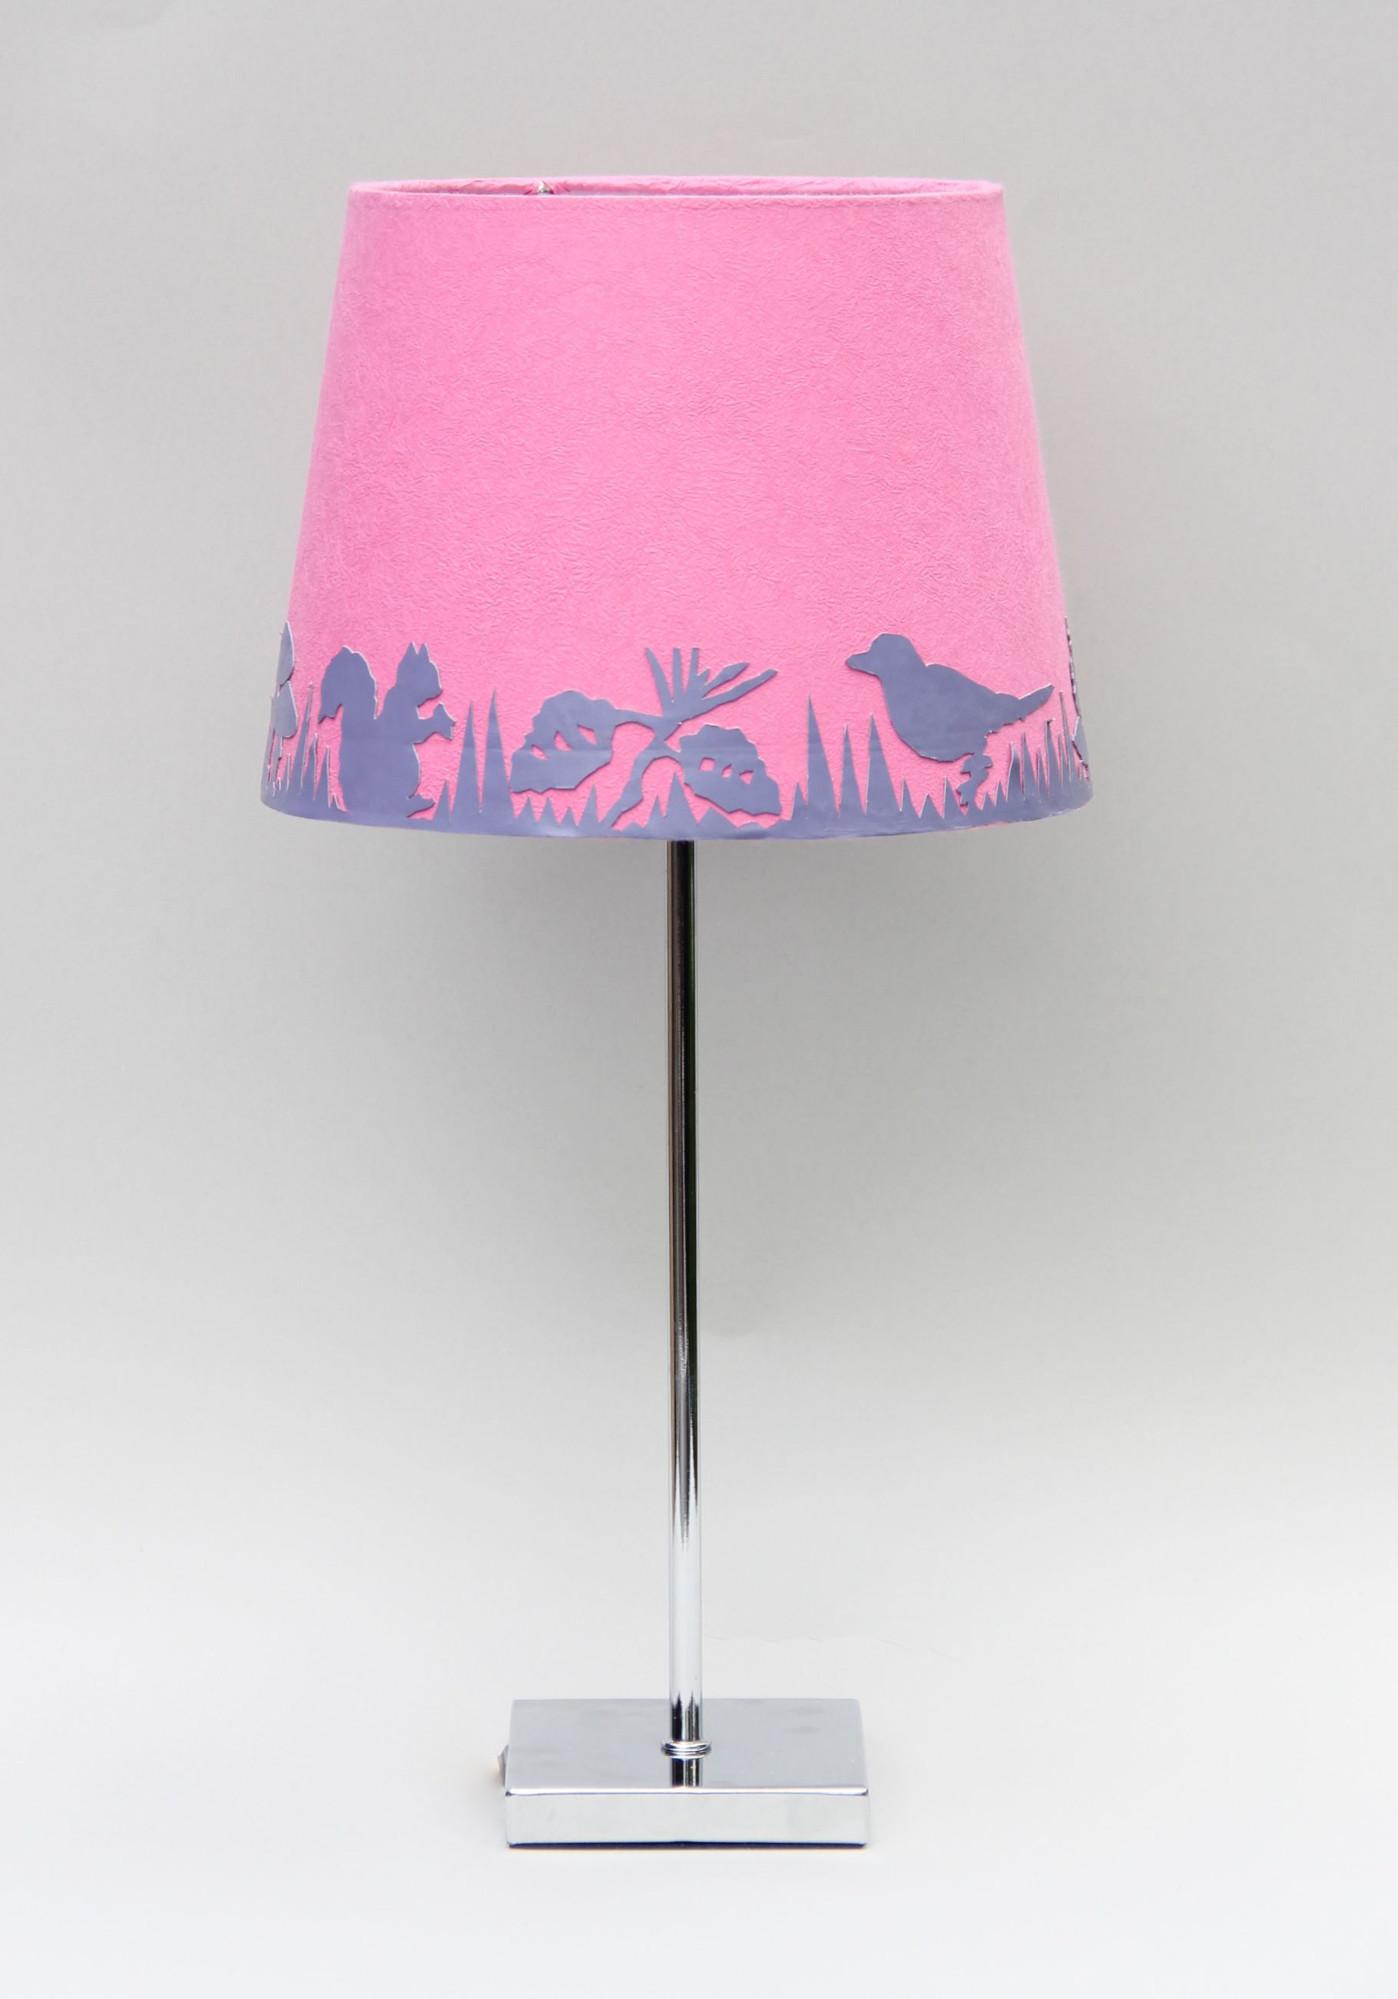 daniela von liebe garden beam lampe lila rosa. Black Bedroom Furniture Sets. Home Design Ideas